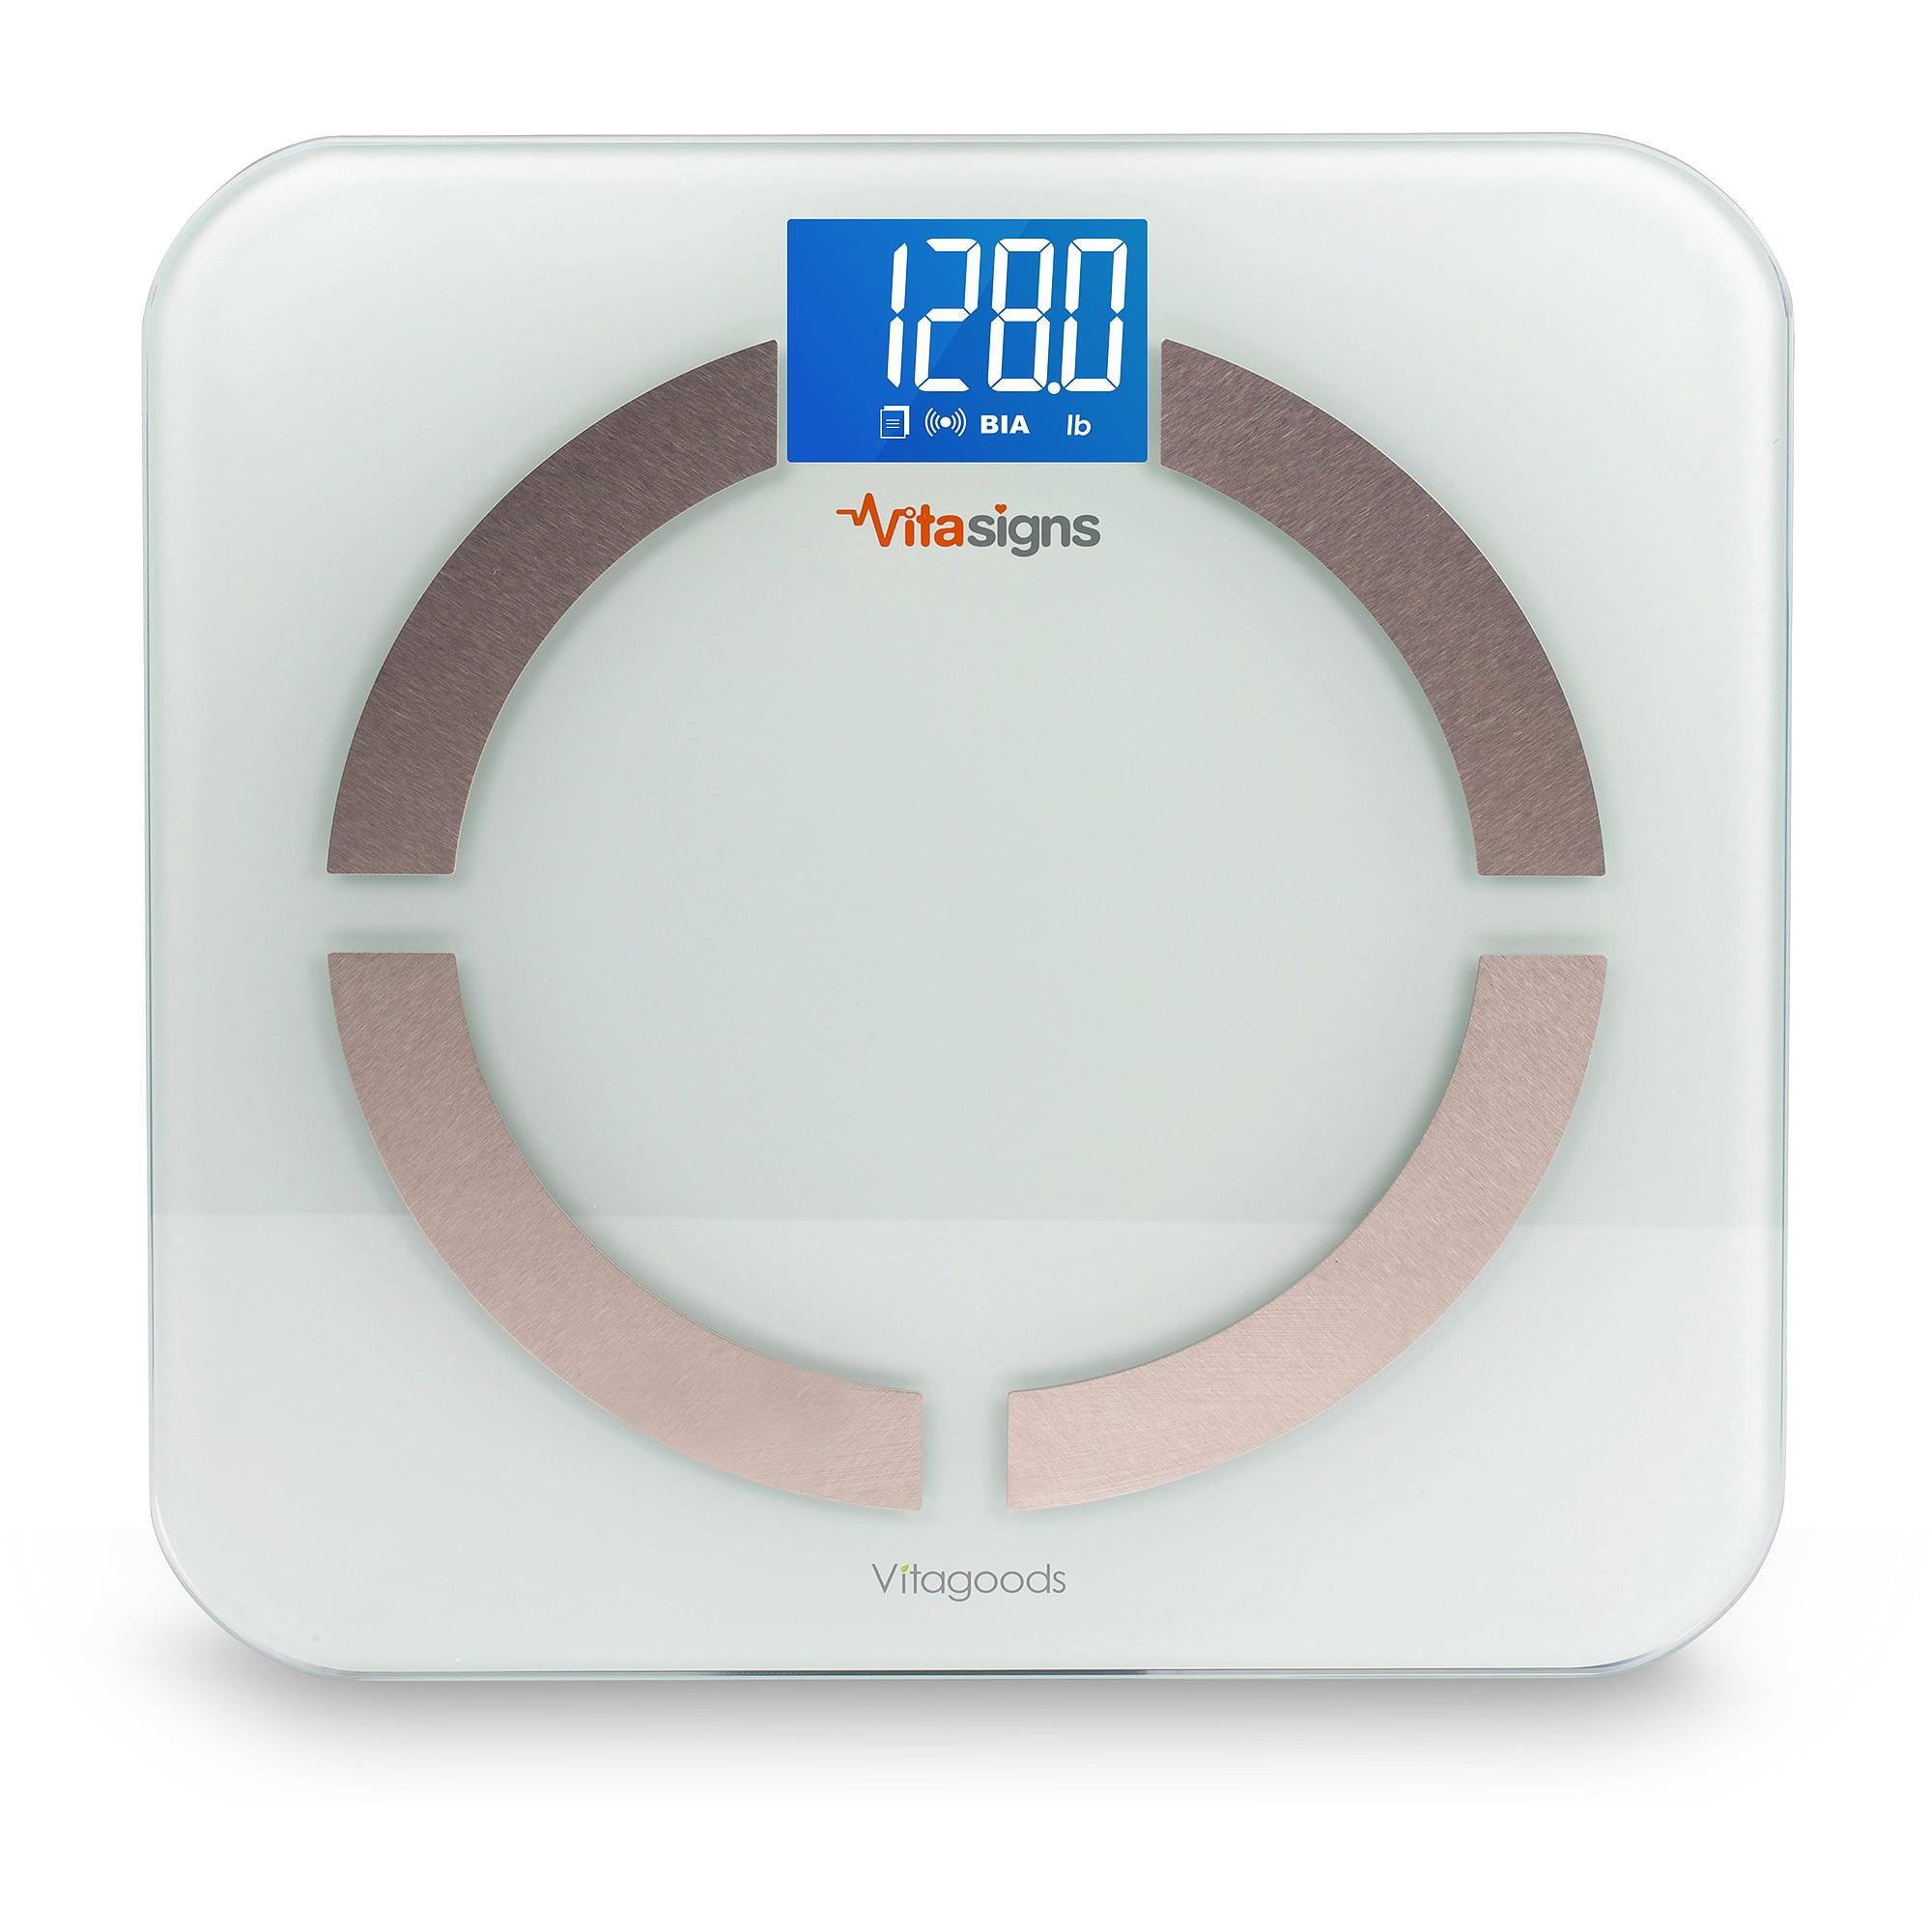 Vitasigns Bluetooth Digital Body Analyzer Scale, Black Glass - White